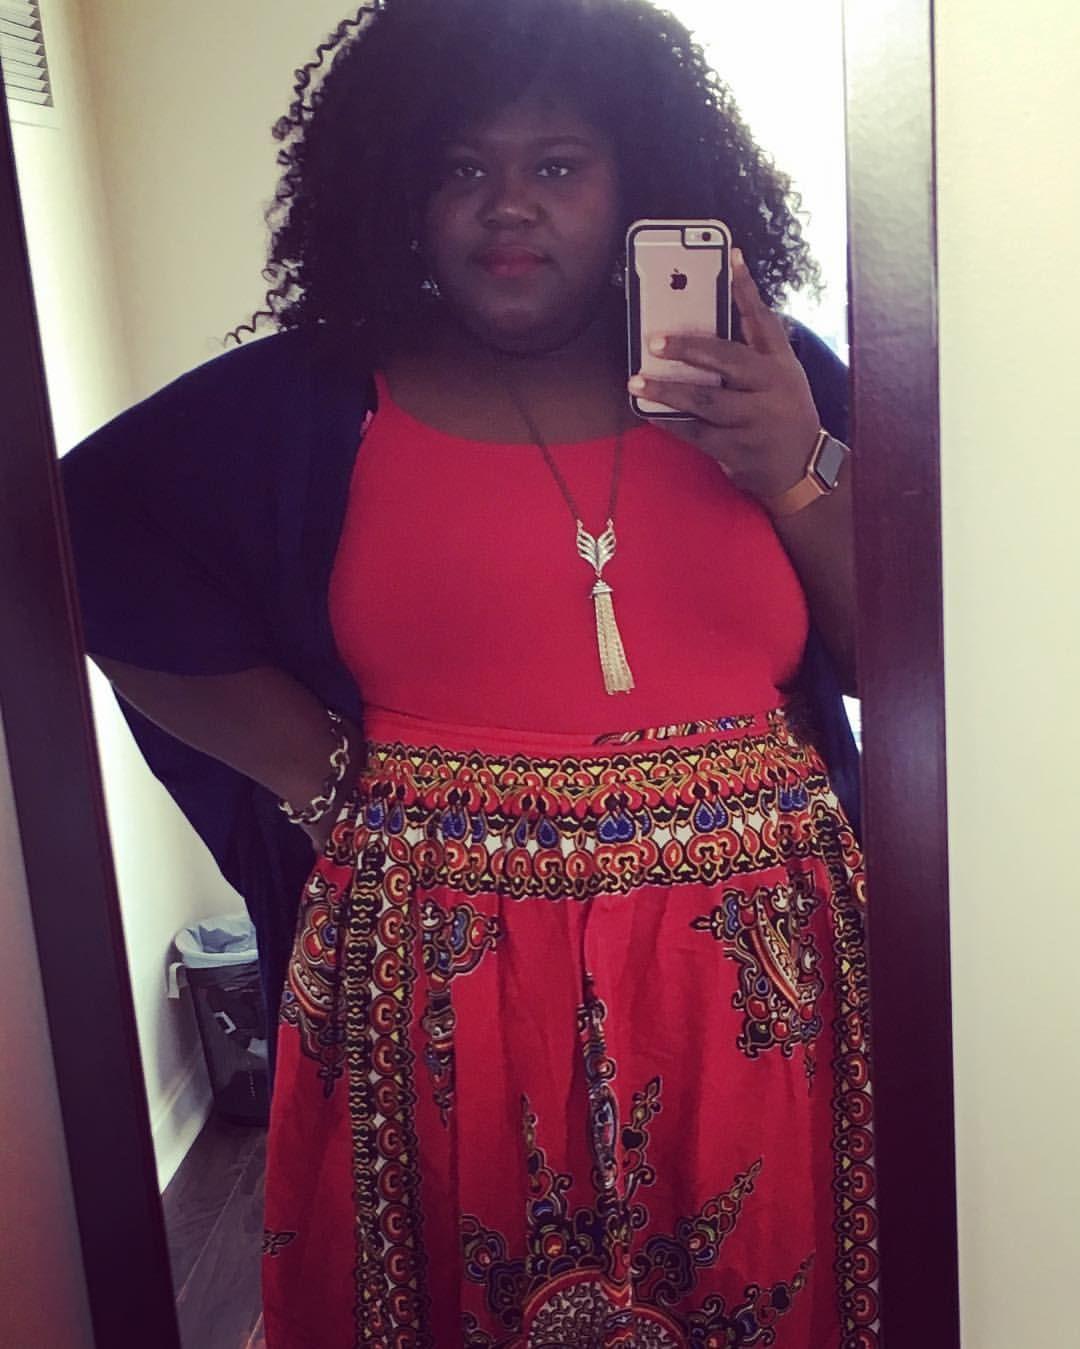 Gabby Sidibe On Instagram I Used To Hate Mirror Selfies Now